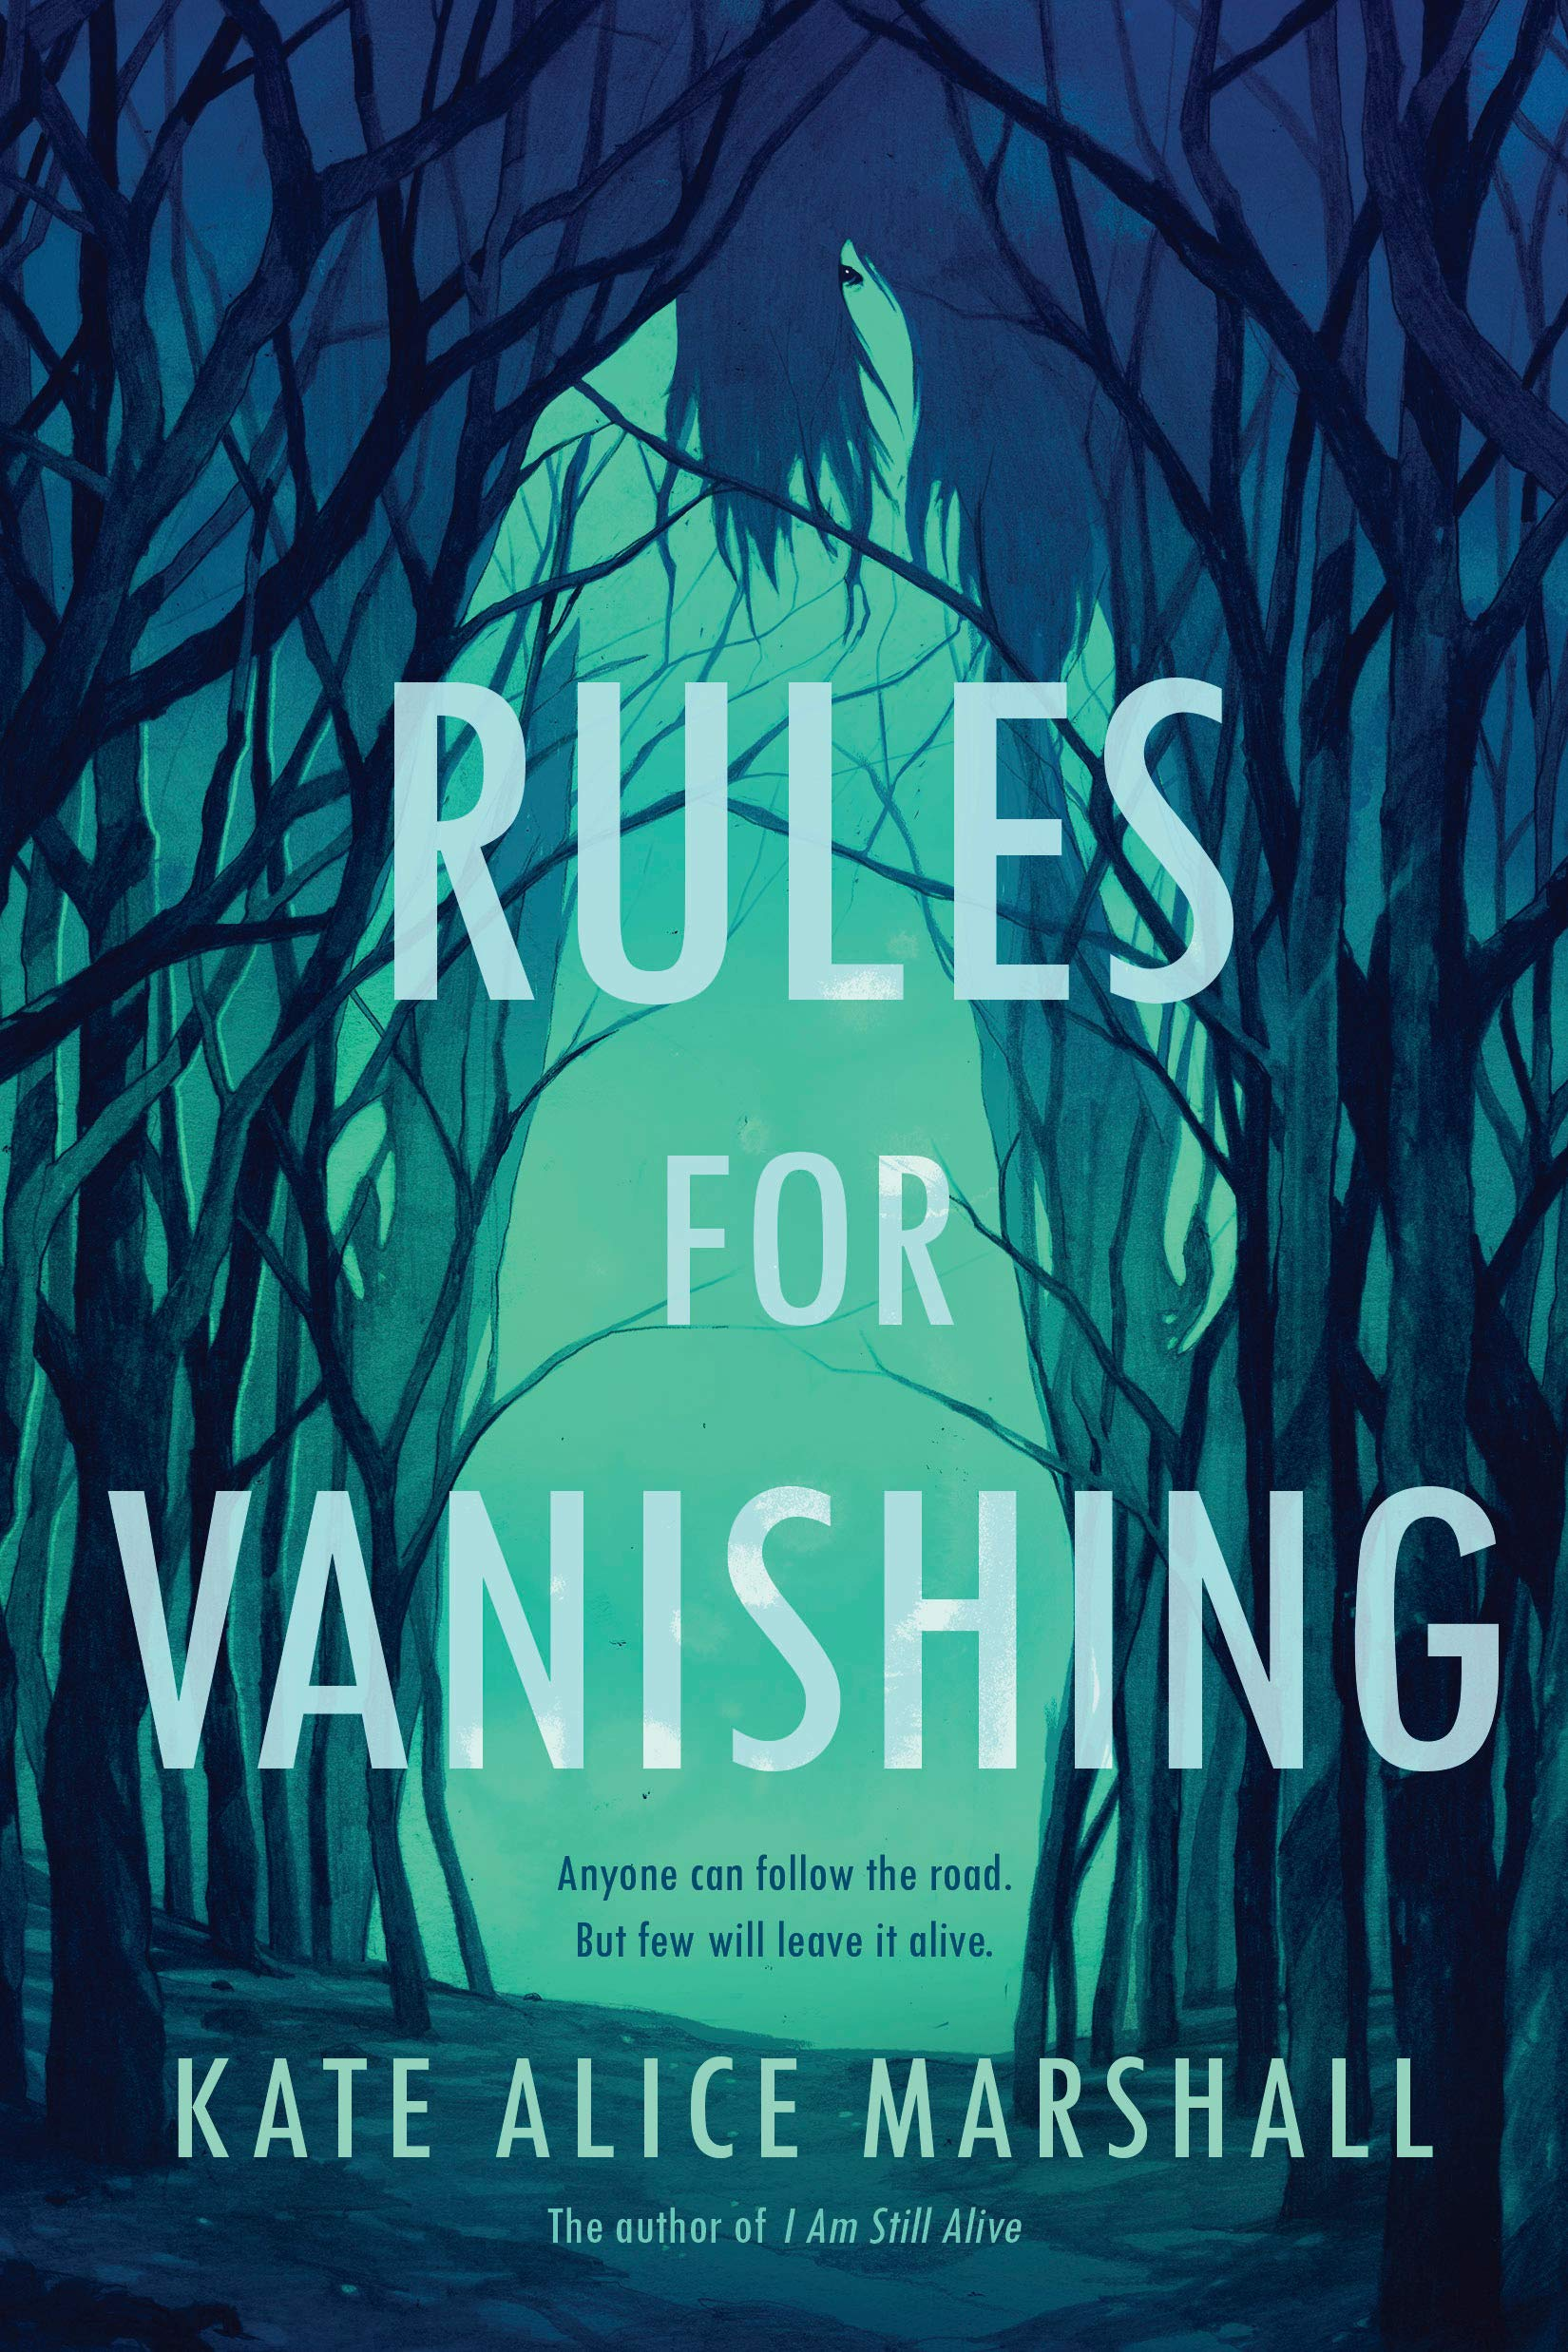 Amazon.com: Rules for Vanishing: 9781984837011: Marshall, Kate Alice: Books